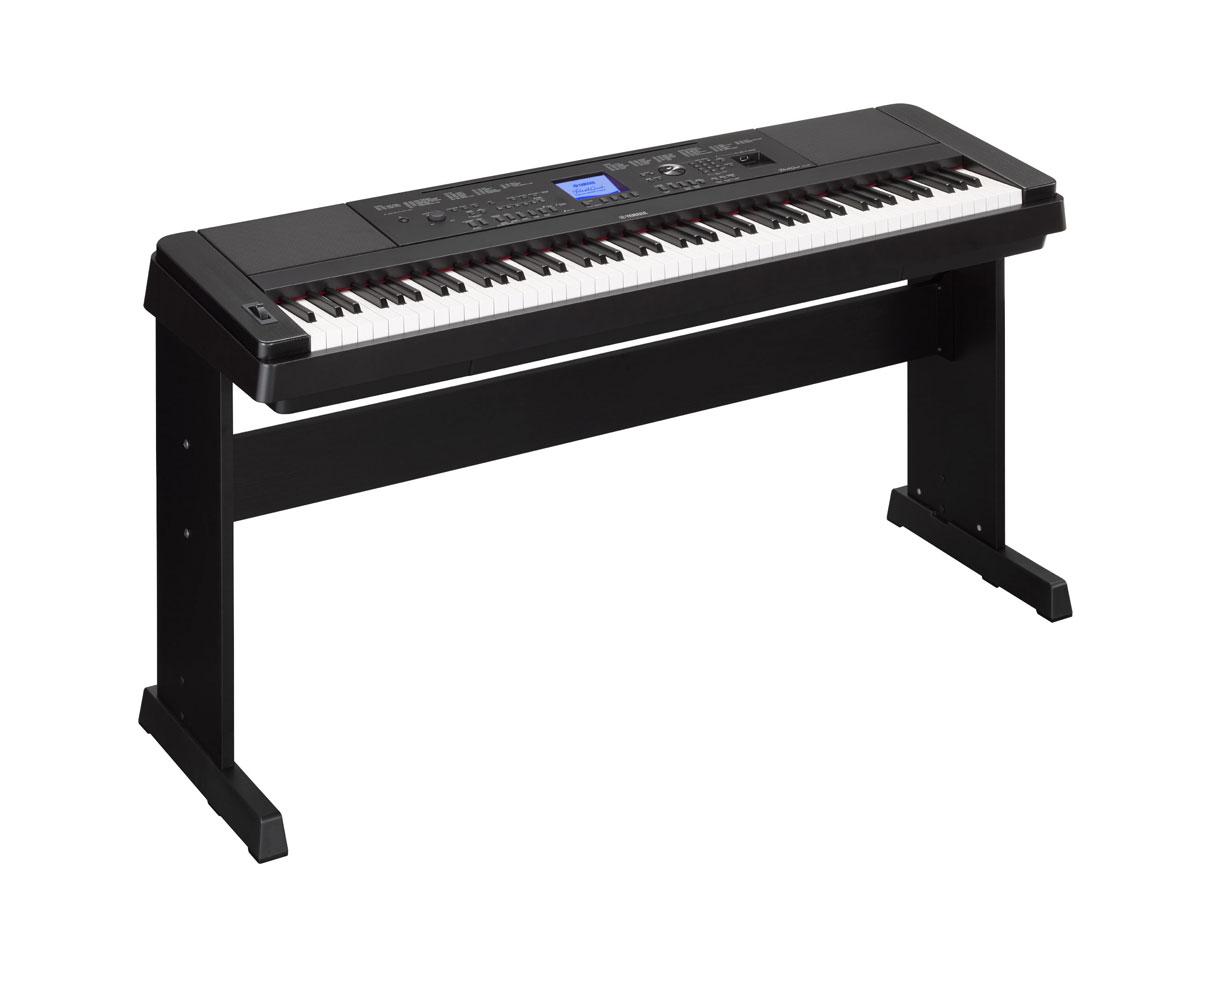 yamaha dgx660b dgx 660 88 key ensemble digital piano w stand proaudiostar ebay. Black Bedroom Furniture Sets. Home Design Ideas